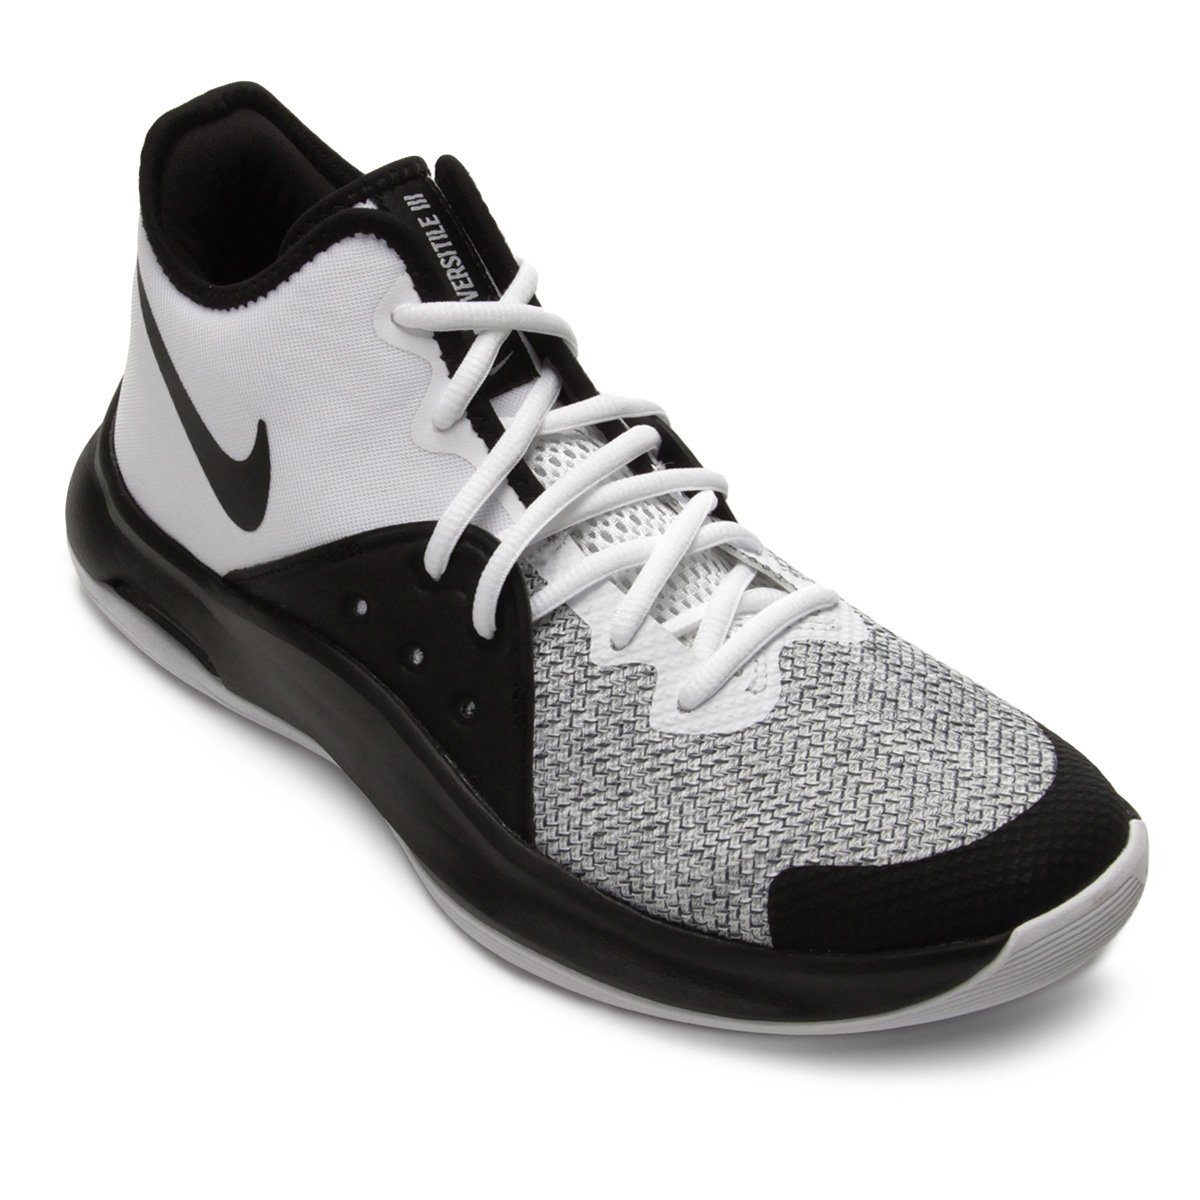 e88cf6f90 Tênis Nike Air Versitile III Masculino - Branco e Preto | Shop Timão